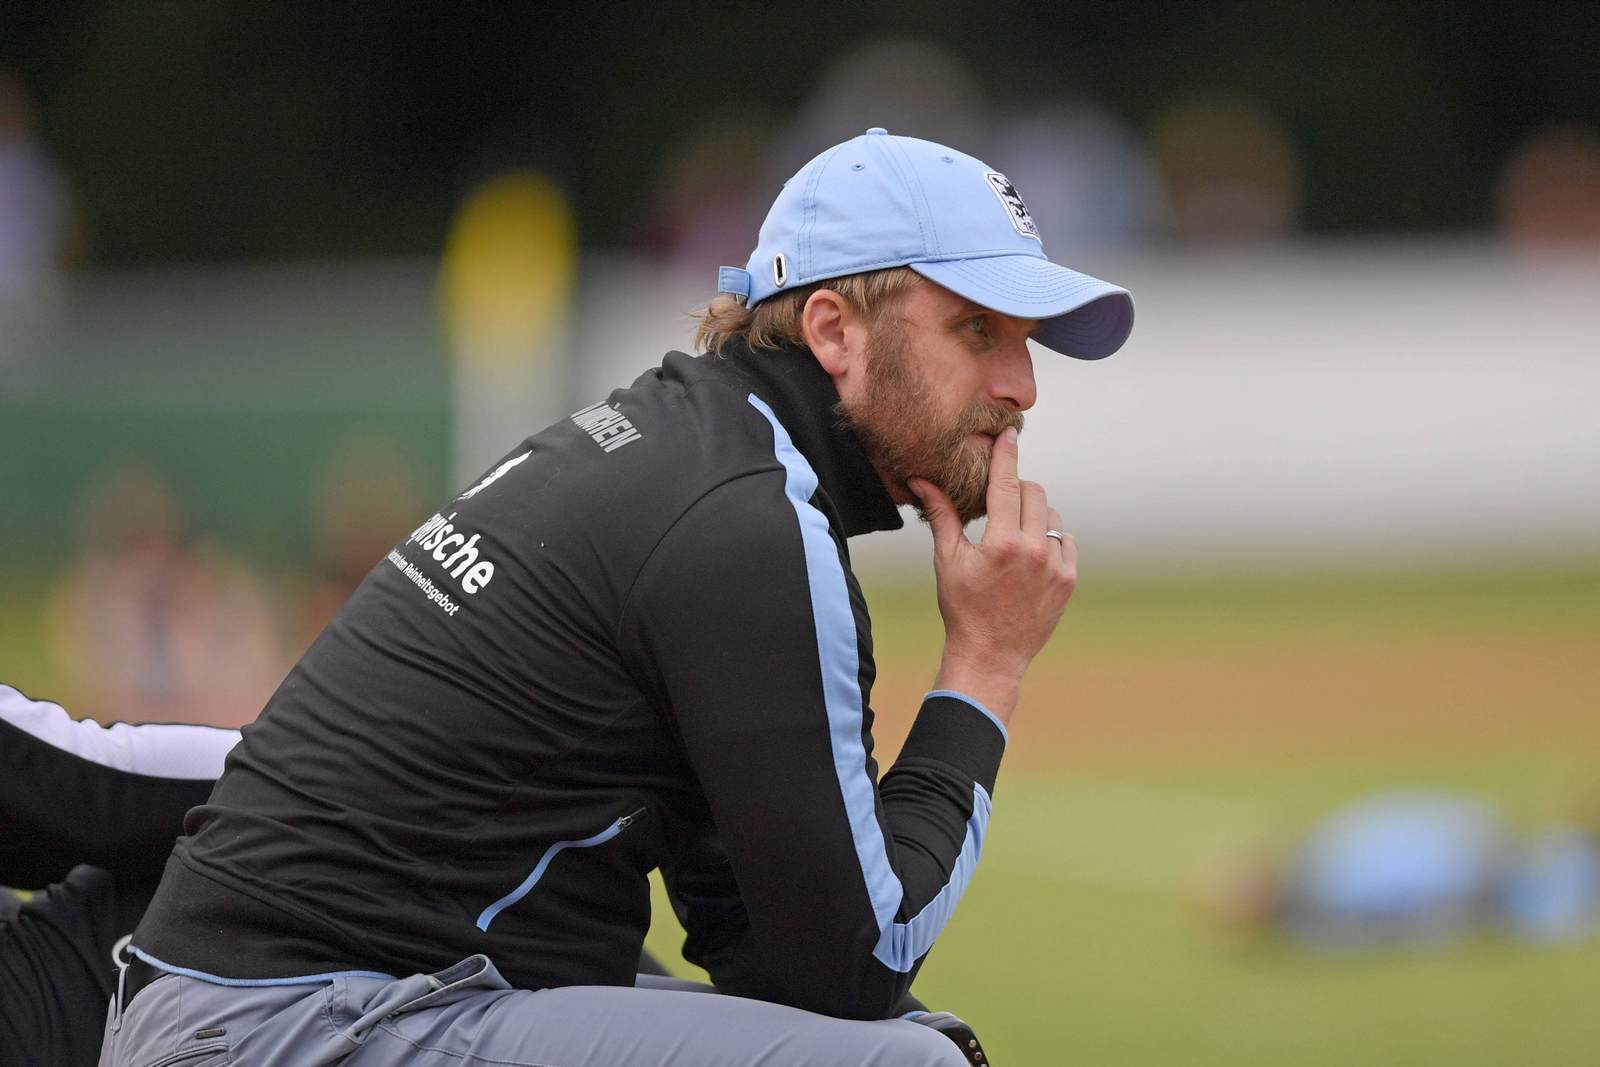 Beobachter in der Ferne: Münchens Trainer Daniel Bierofka